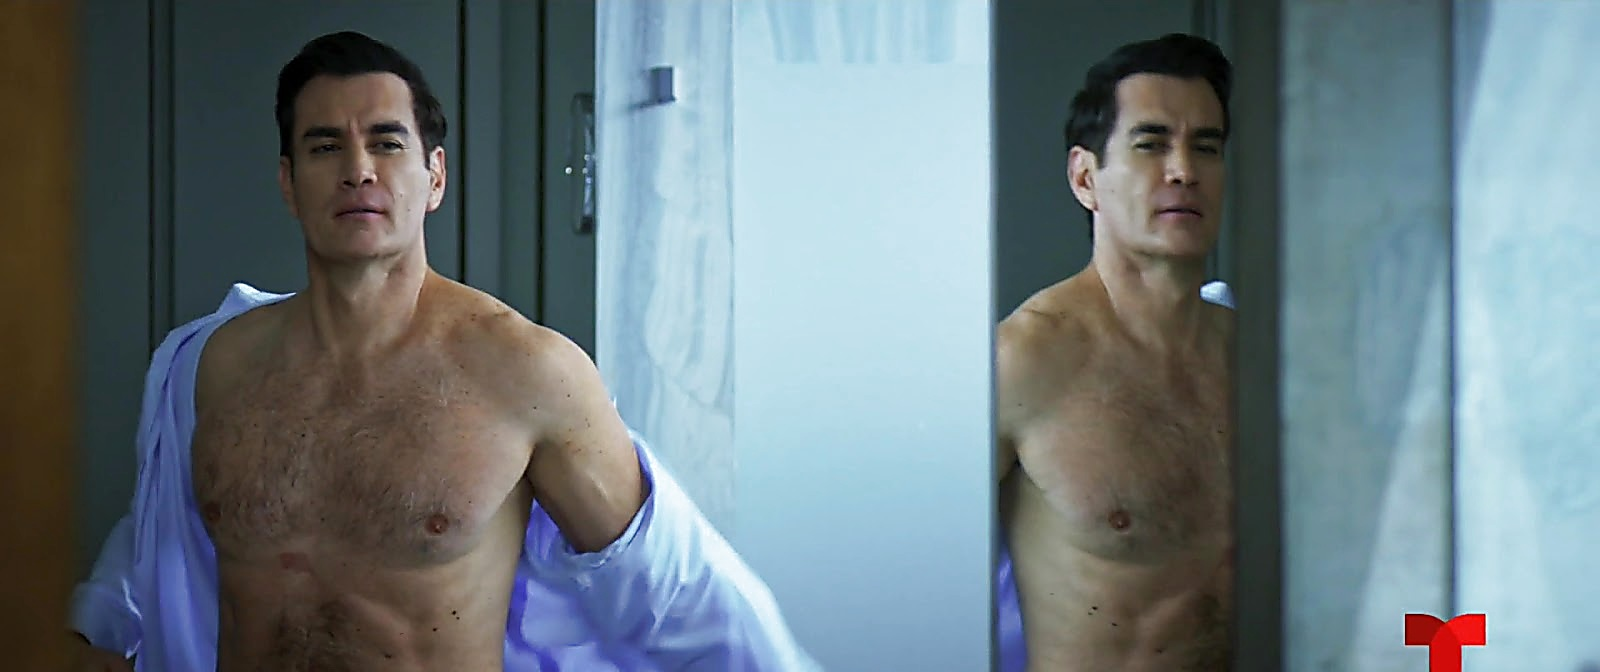 David Zepeda sexy shirtless scene July 24, 2020, 4am